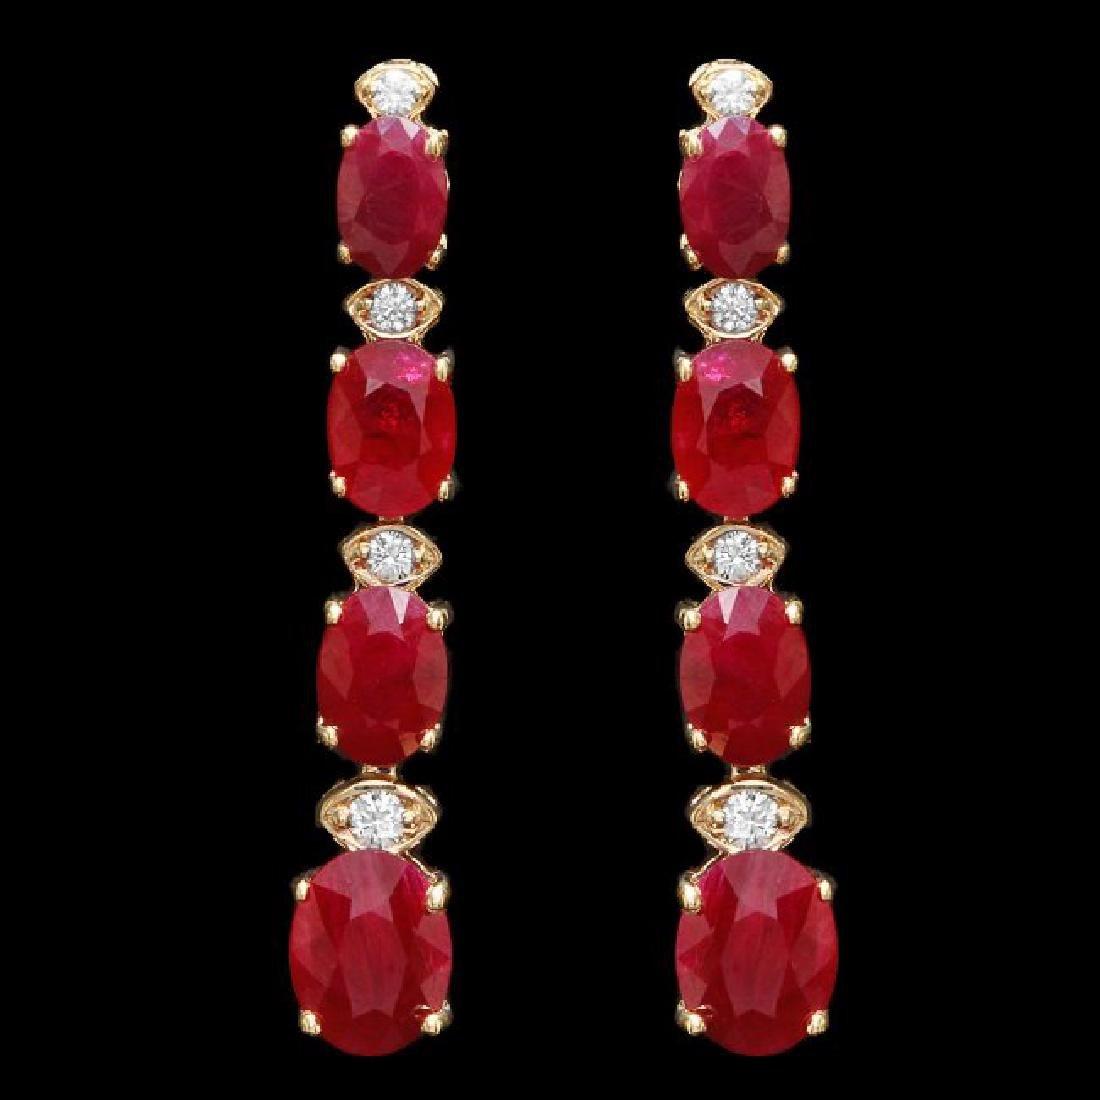 14k Gold 9.00ct Ruby 0.25ct Diamond Earrings